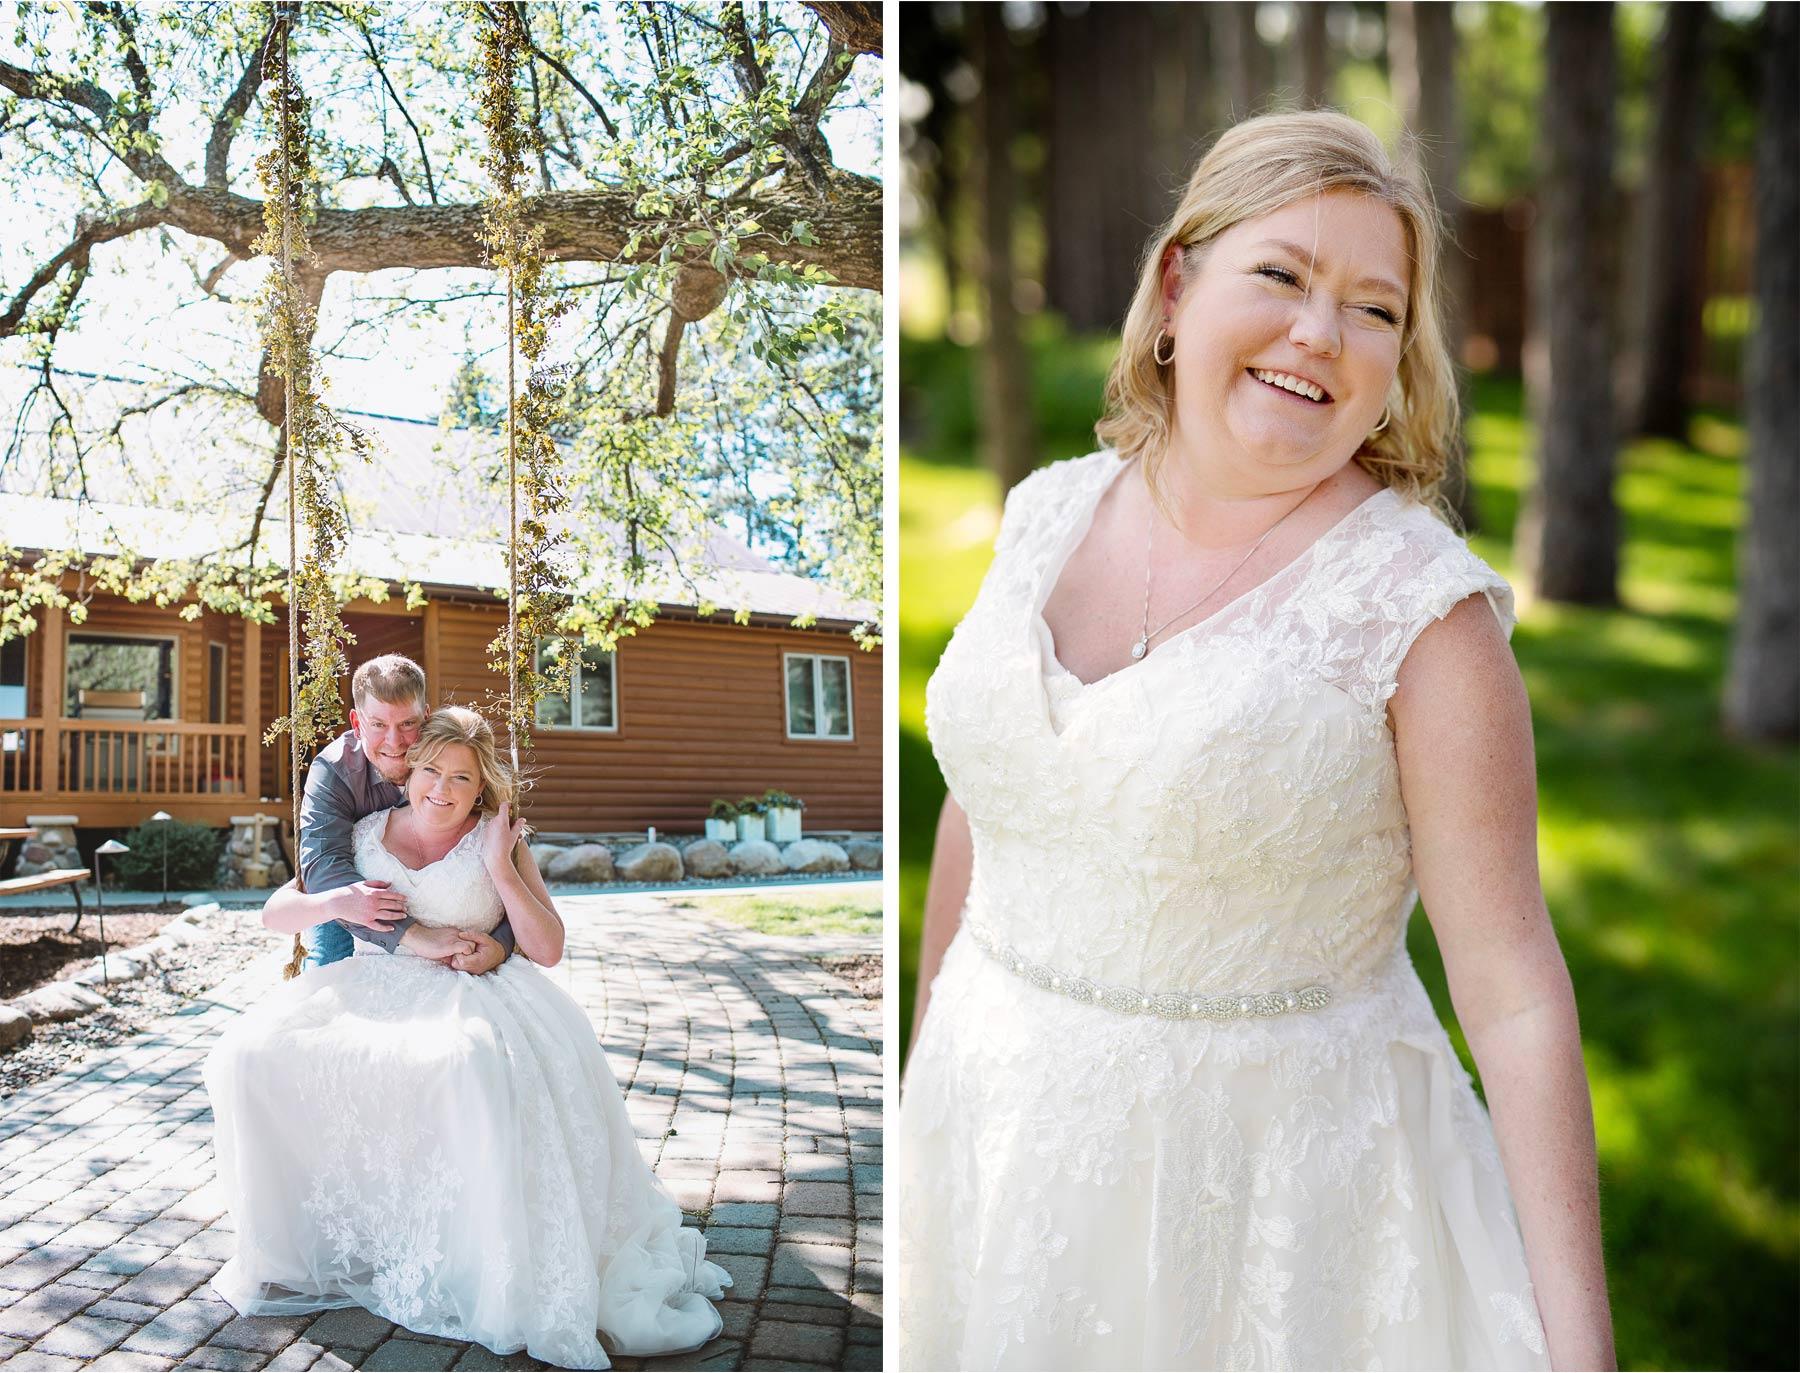 06-Vick-Photography-Wedding-Brainerd-Minnesota-Pine-Peaks-Lodge-Cabin-Rustic-Bride-Swing-Kristi-and-Noel.jpg